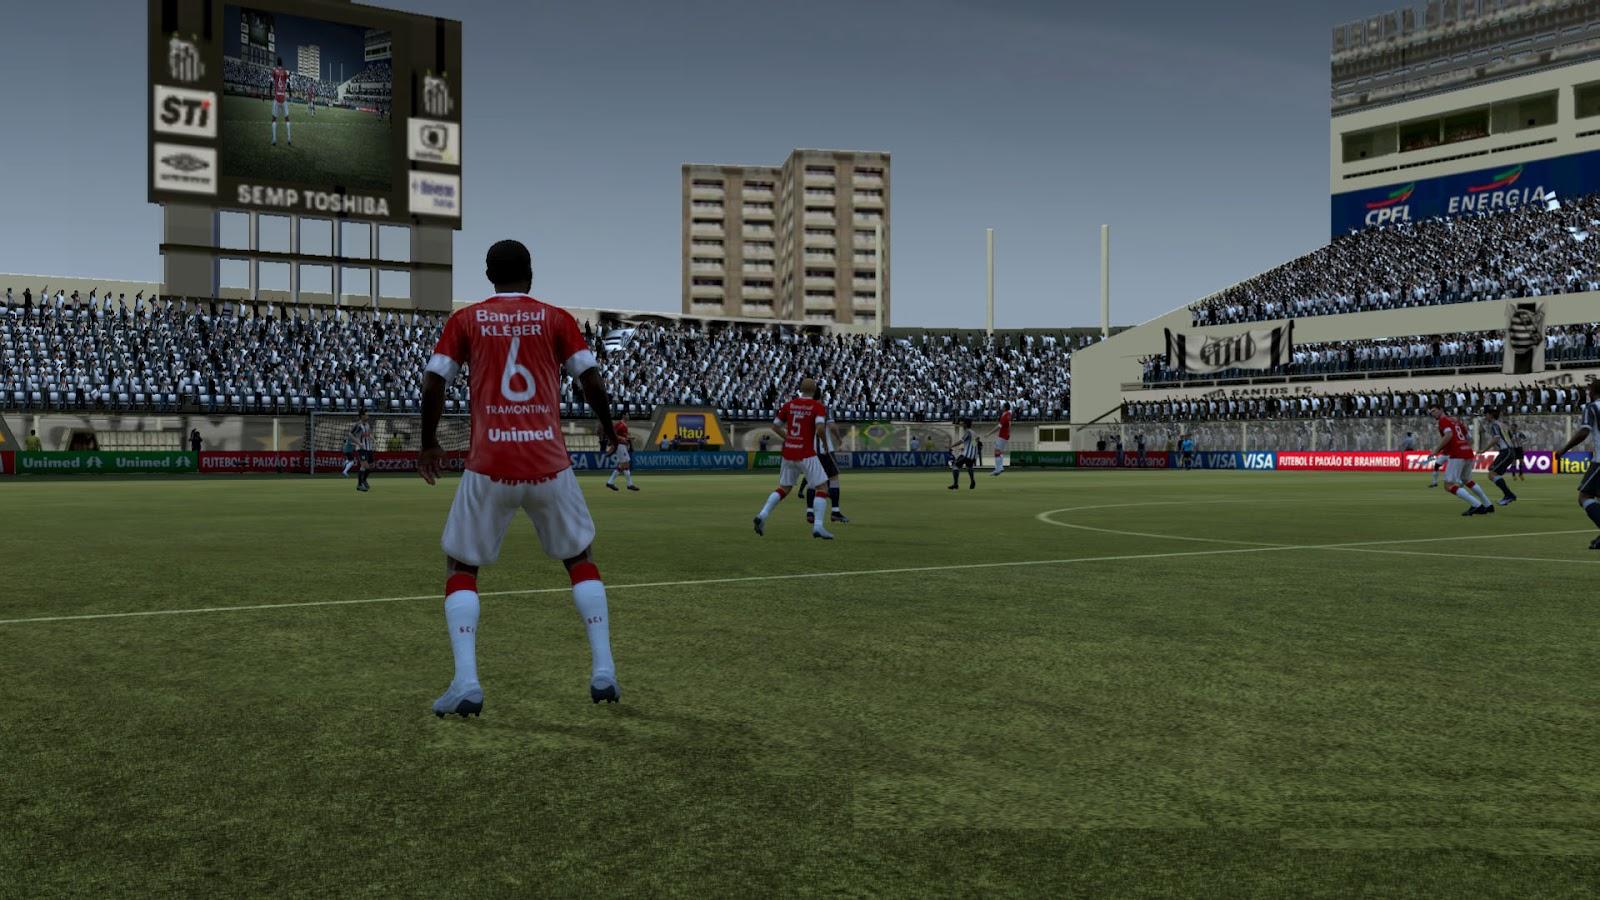 fifa12 vila+belmiro1 FIFA 12: Estádio Vila Belmiro